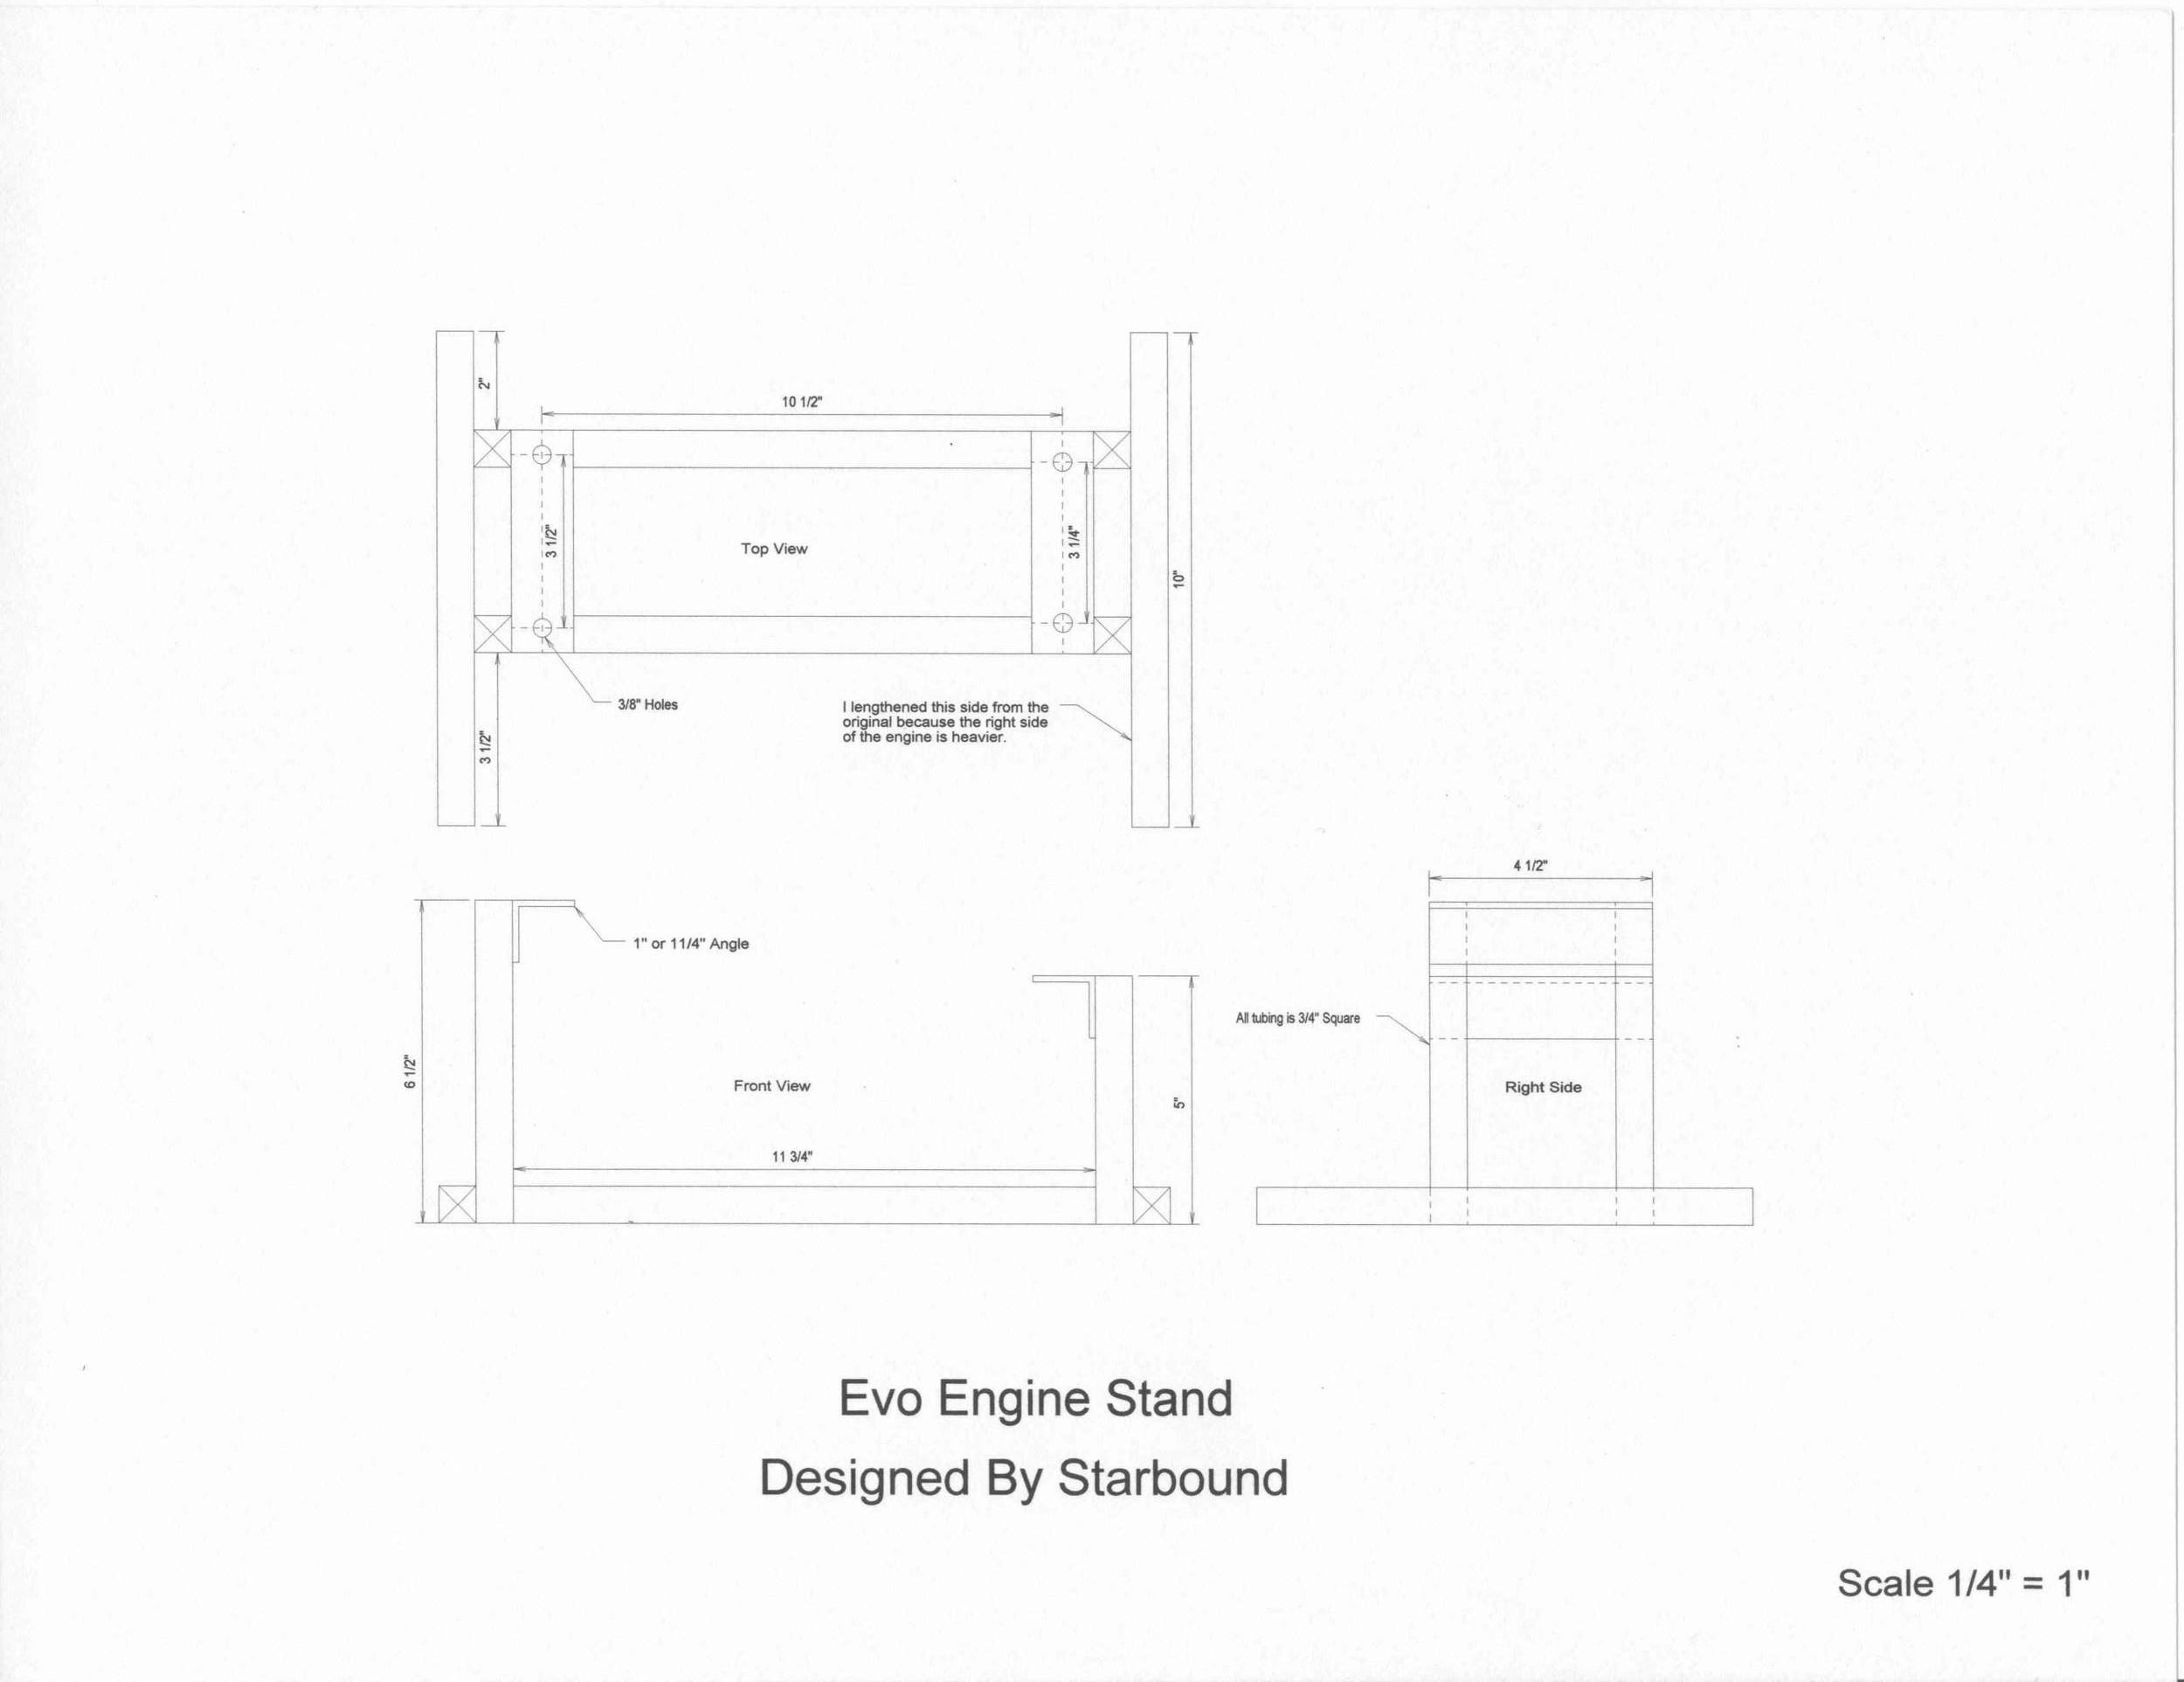 medium resolution of 80 harley evolution engine diagram wiring diagramplans for a harley motor stand u2013 mustaribrandharley